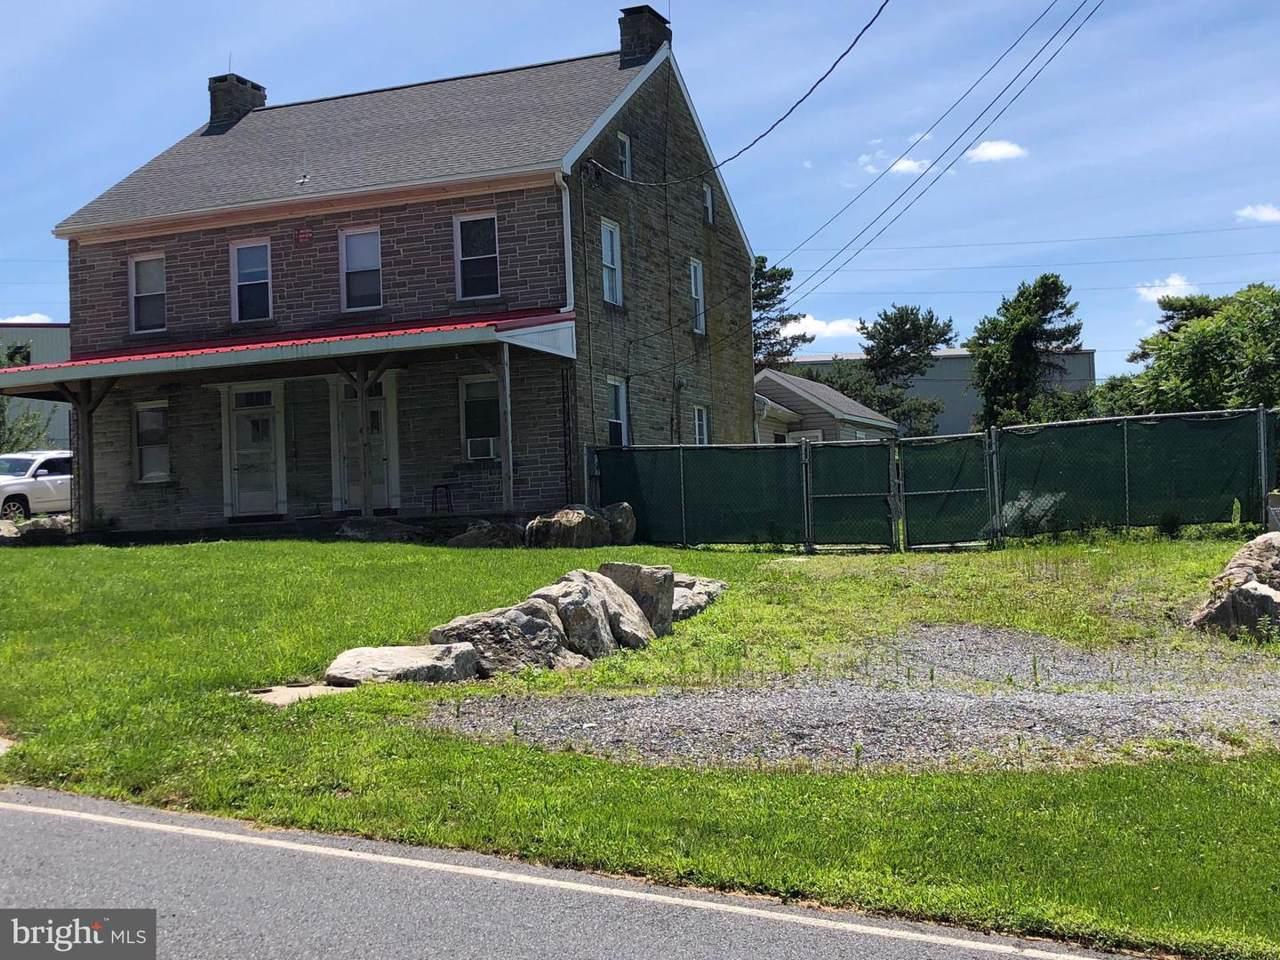 74 Willow Creek Road - Photo 1